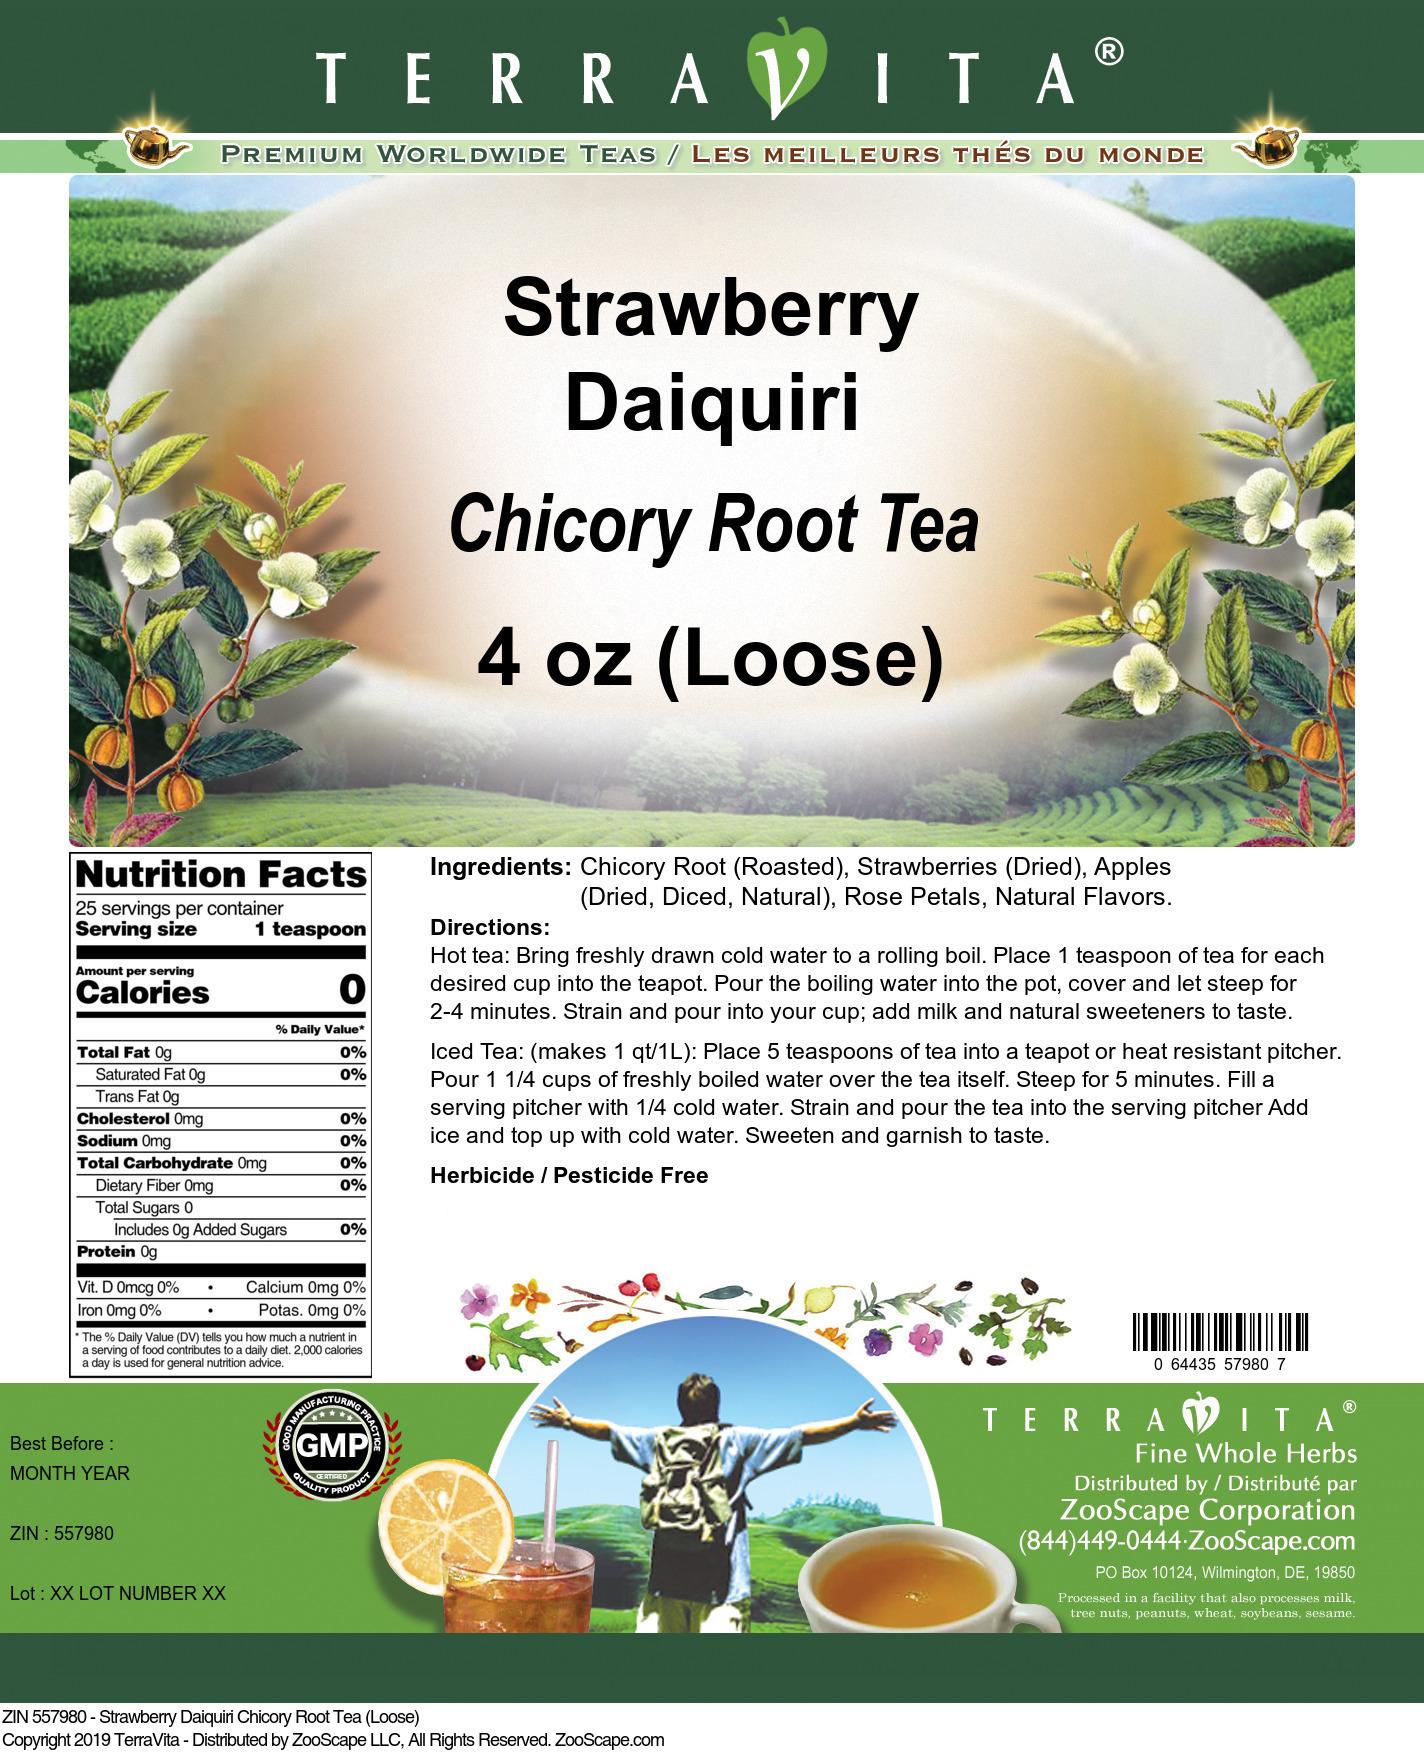 Strawberry Daiquiri Chicory Root Tea (Loose)